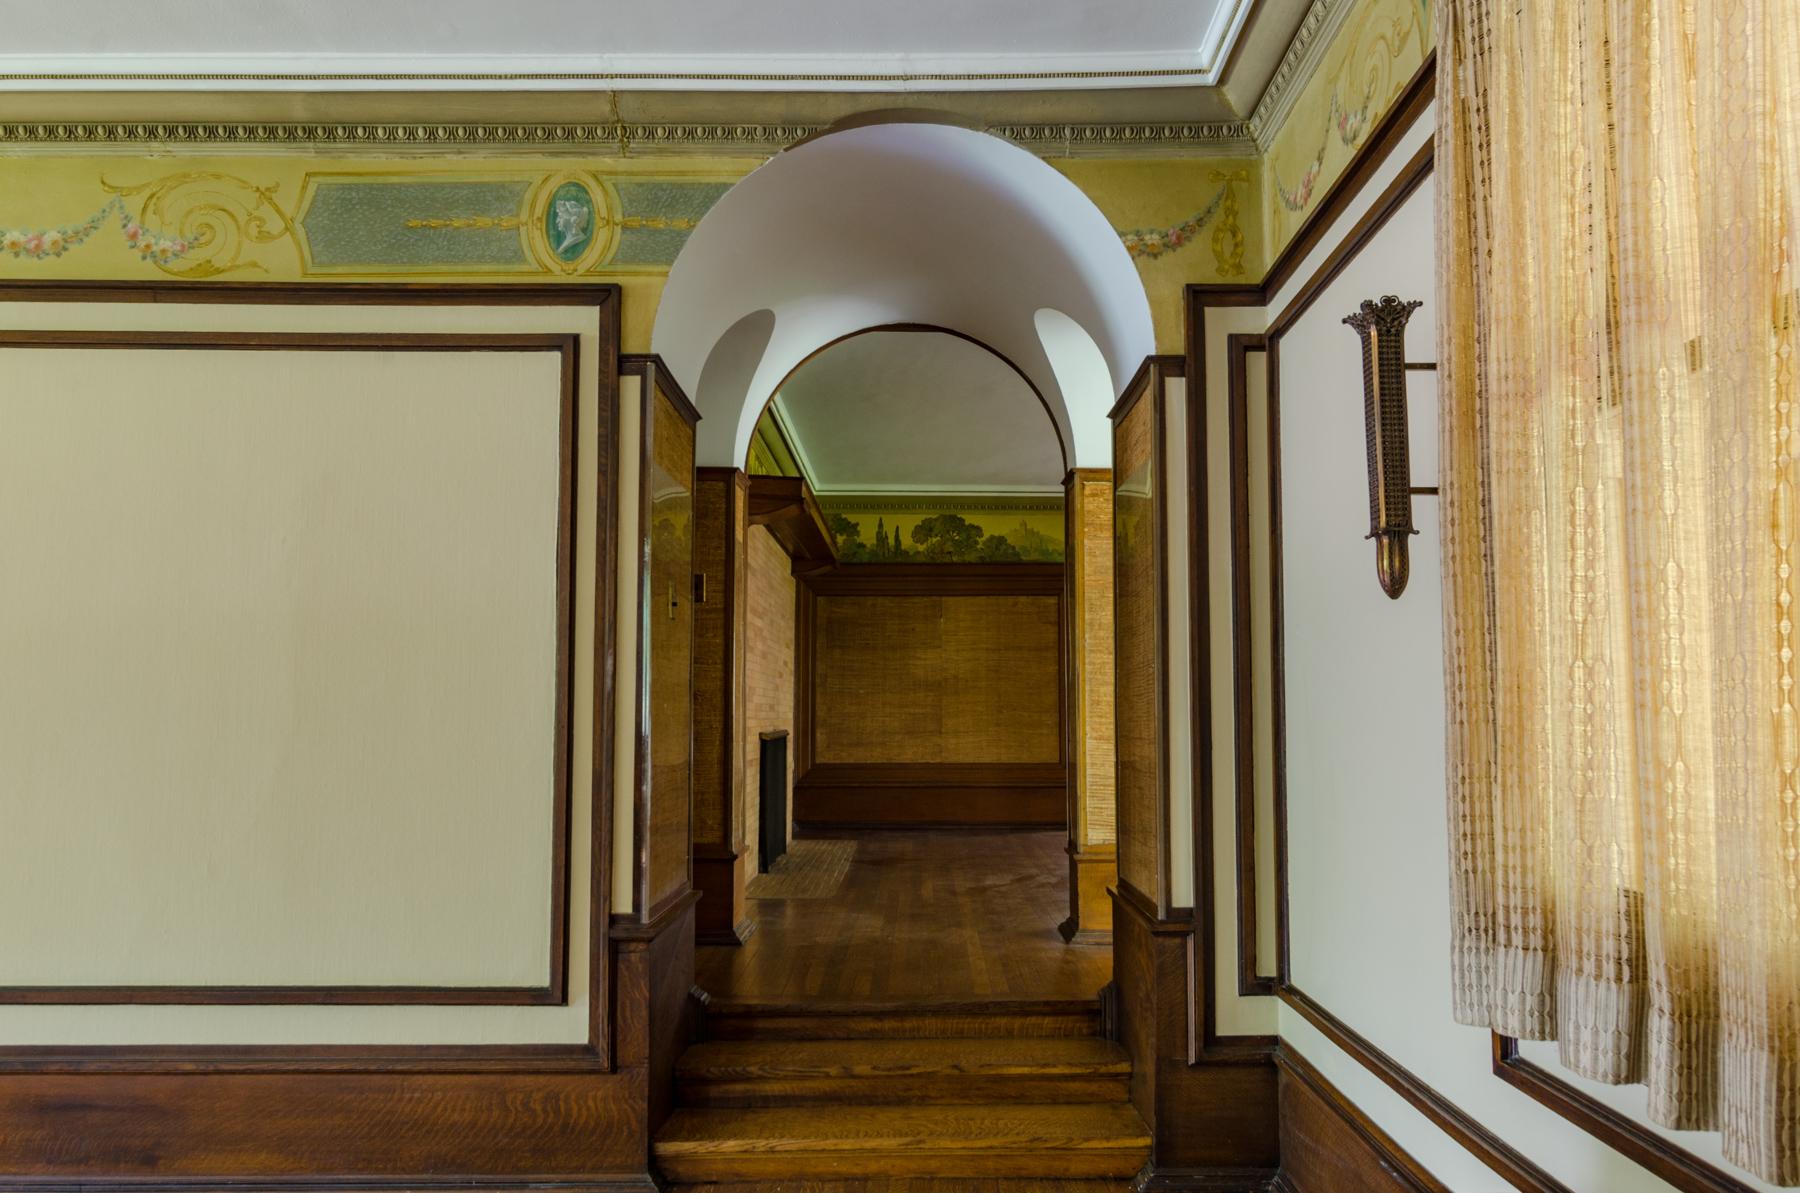 How Louis Sullivan 39 S Organic Architecture Inspired Frank